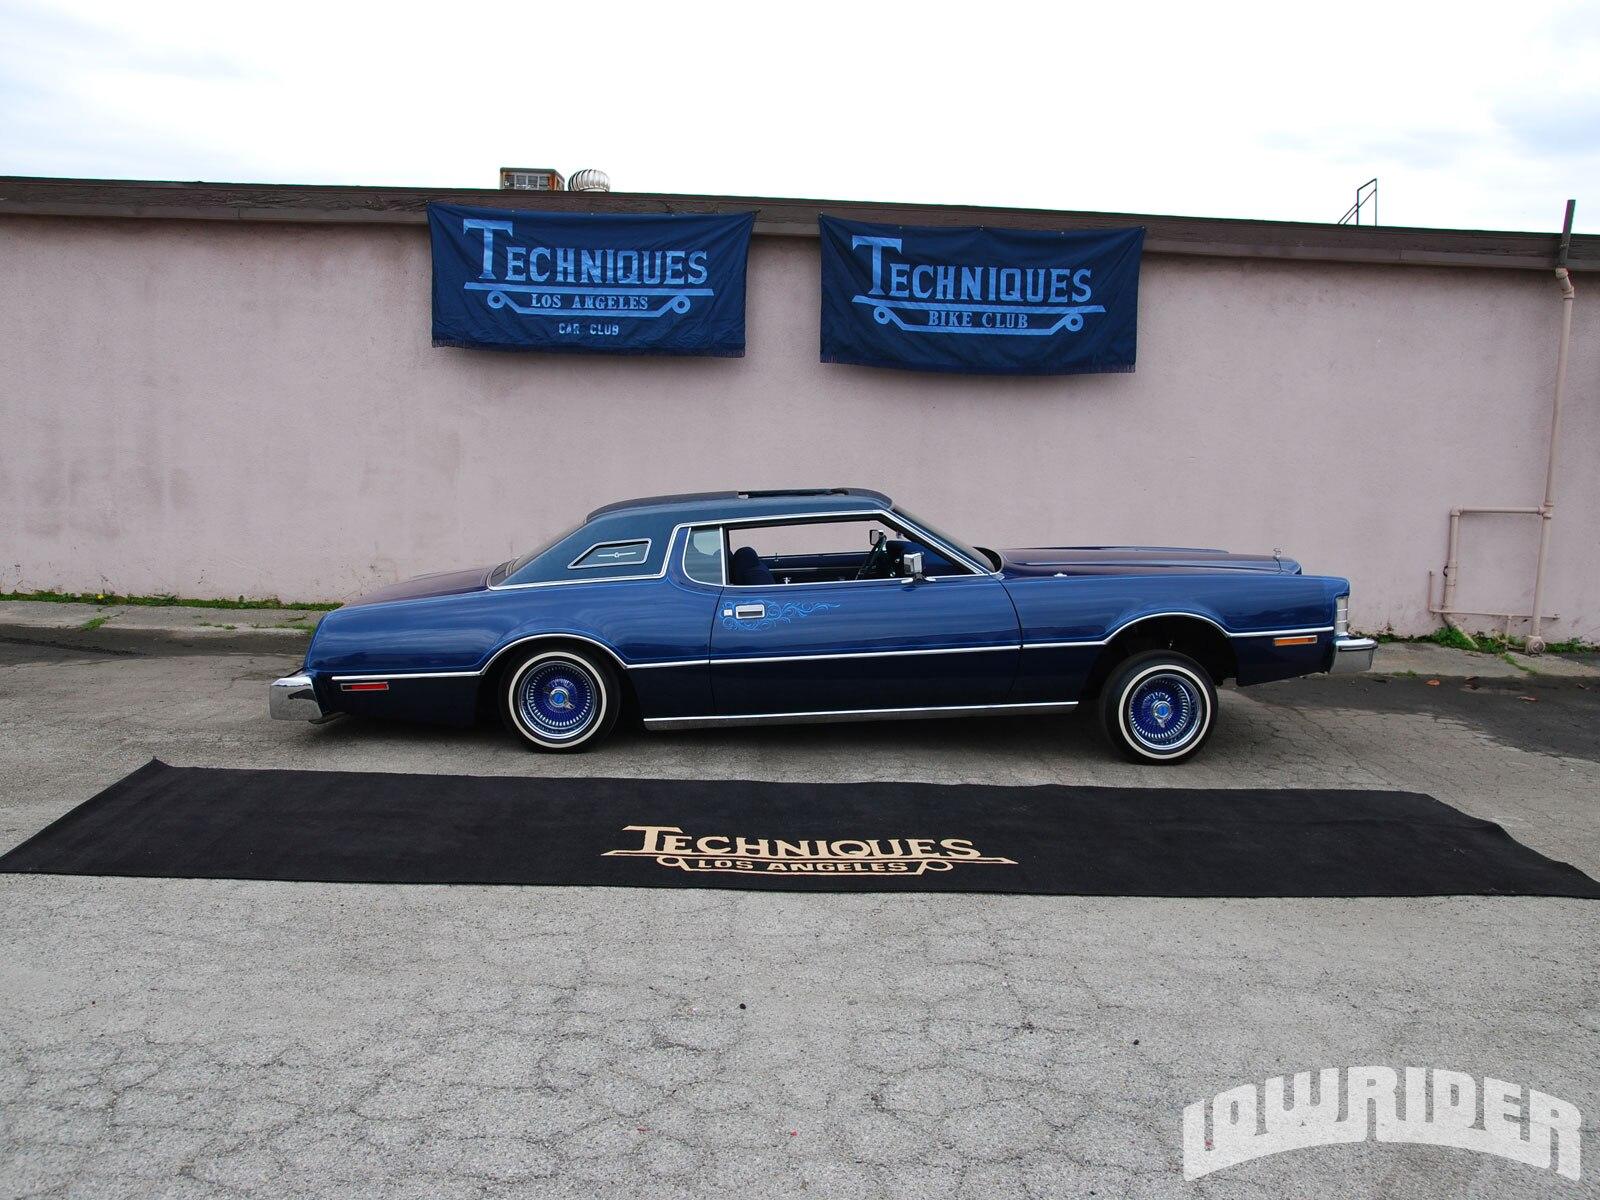 11|12 & Raymond u201cRayu201d Carrillo Techniques Car Club - Lowrider Magazine markmcfarlin.com